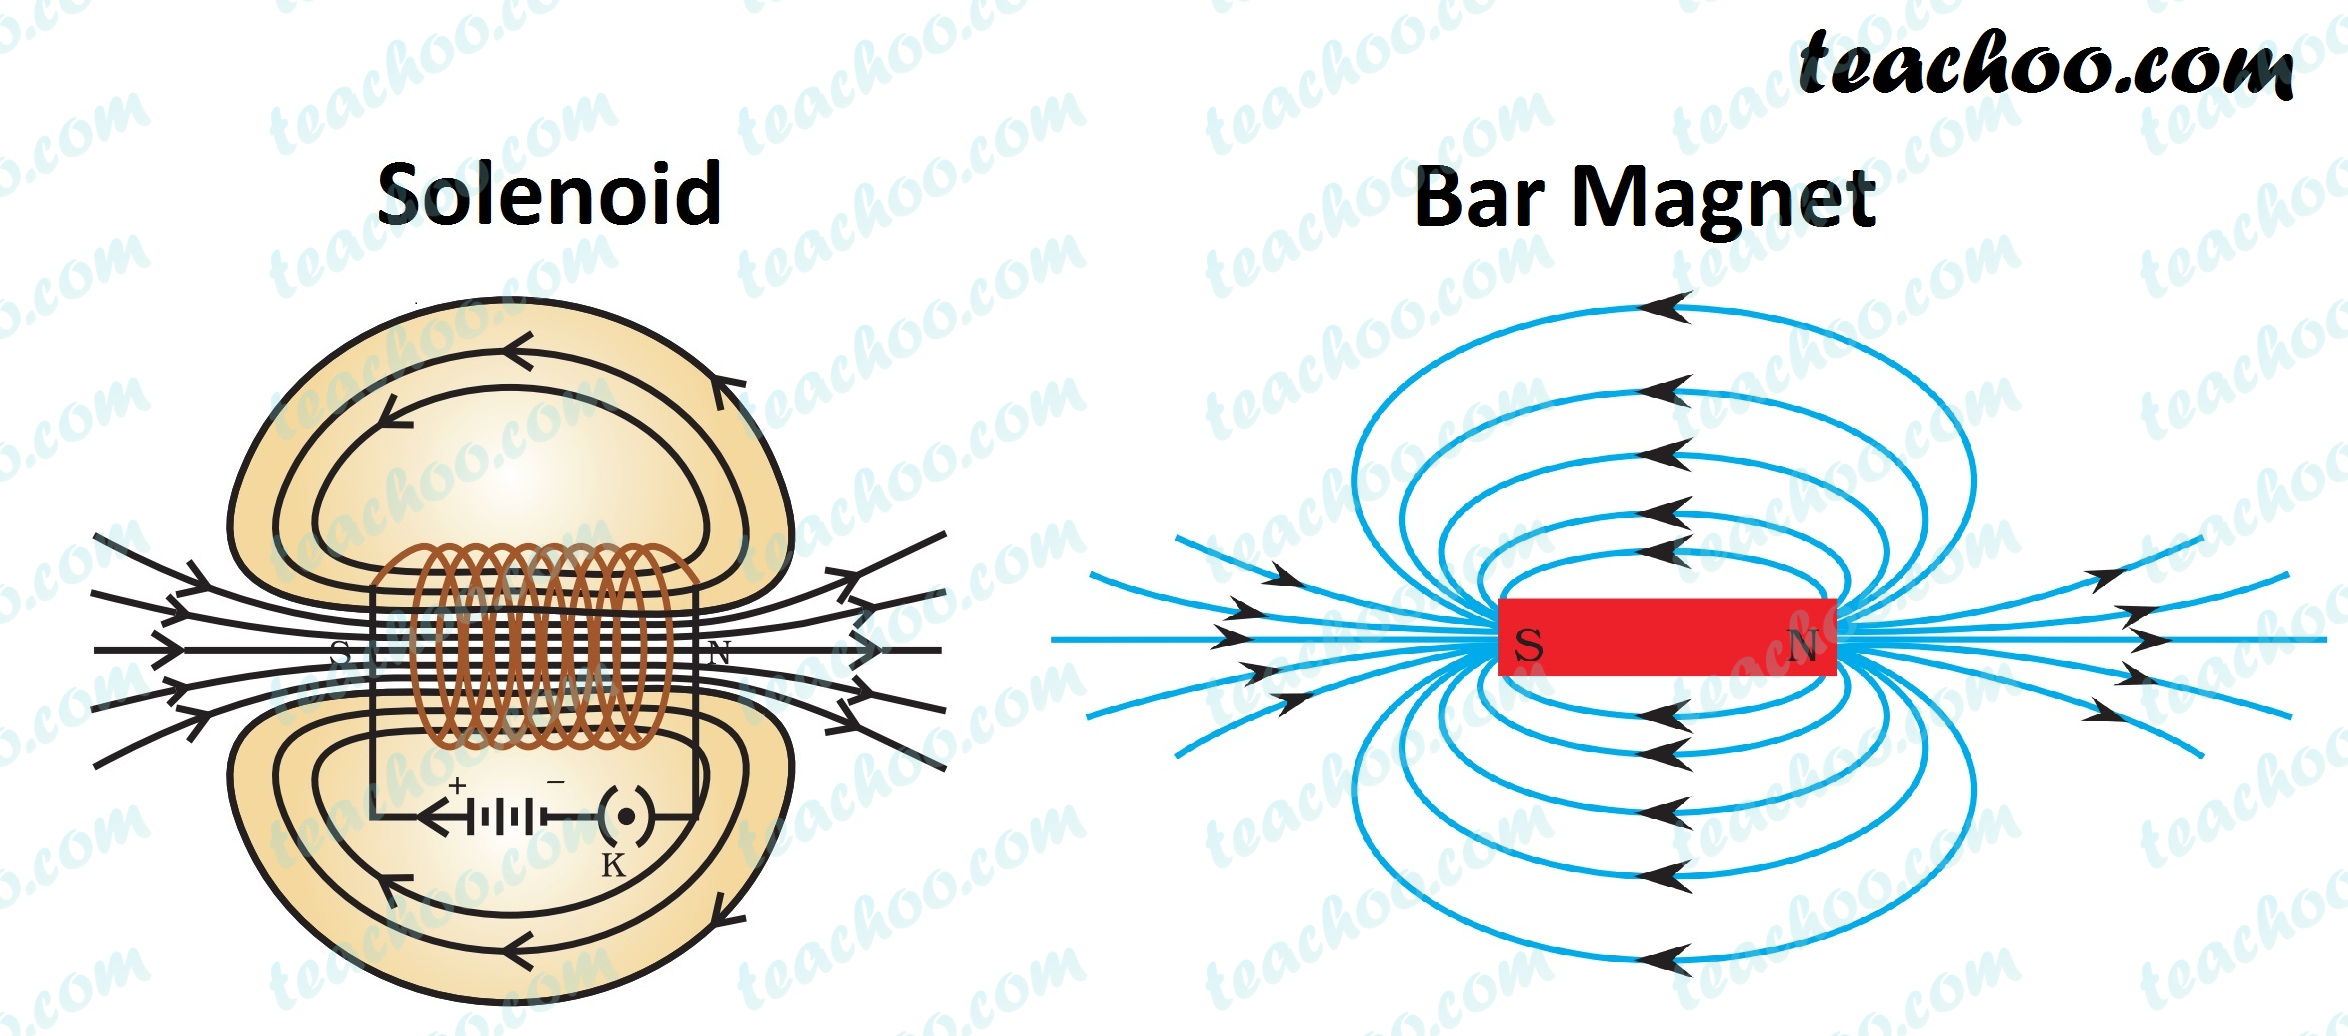 solenoid-and-bar-magnet-similarity---teachoo.jpg